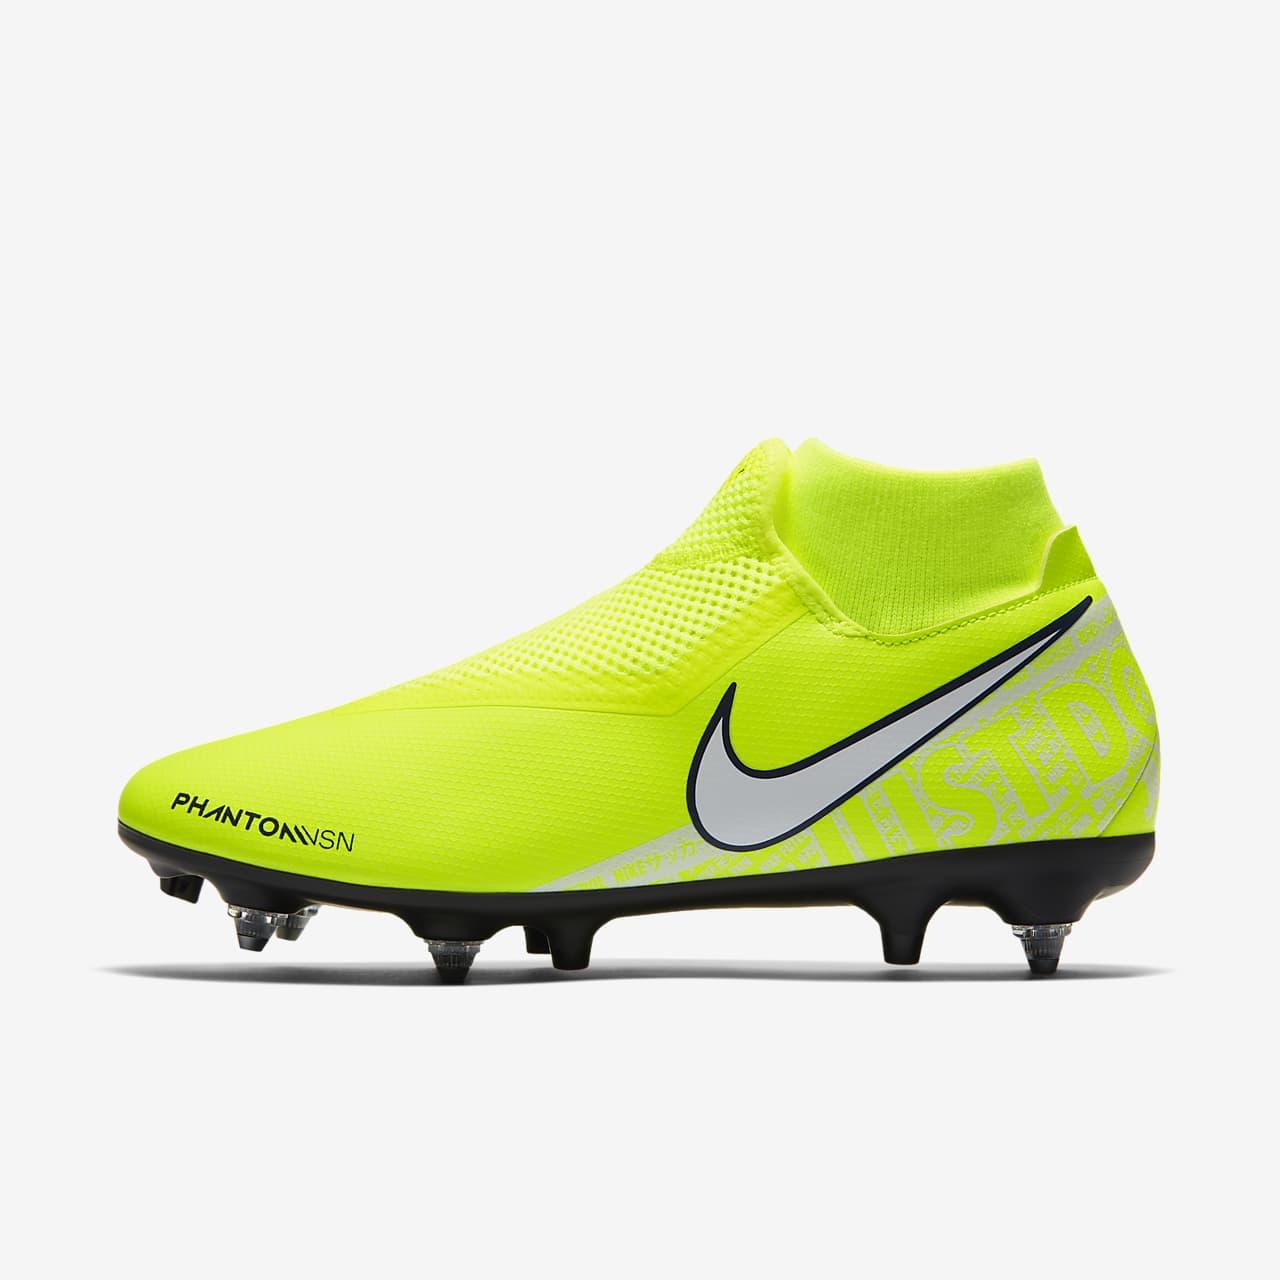 Nike PhantomVSN Academy Dynamic Fit SG-Pro Anti-Clog Traction Soft-Ground Football Boot